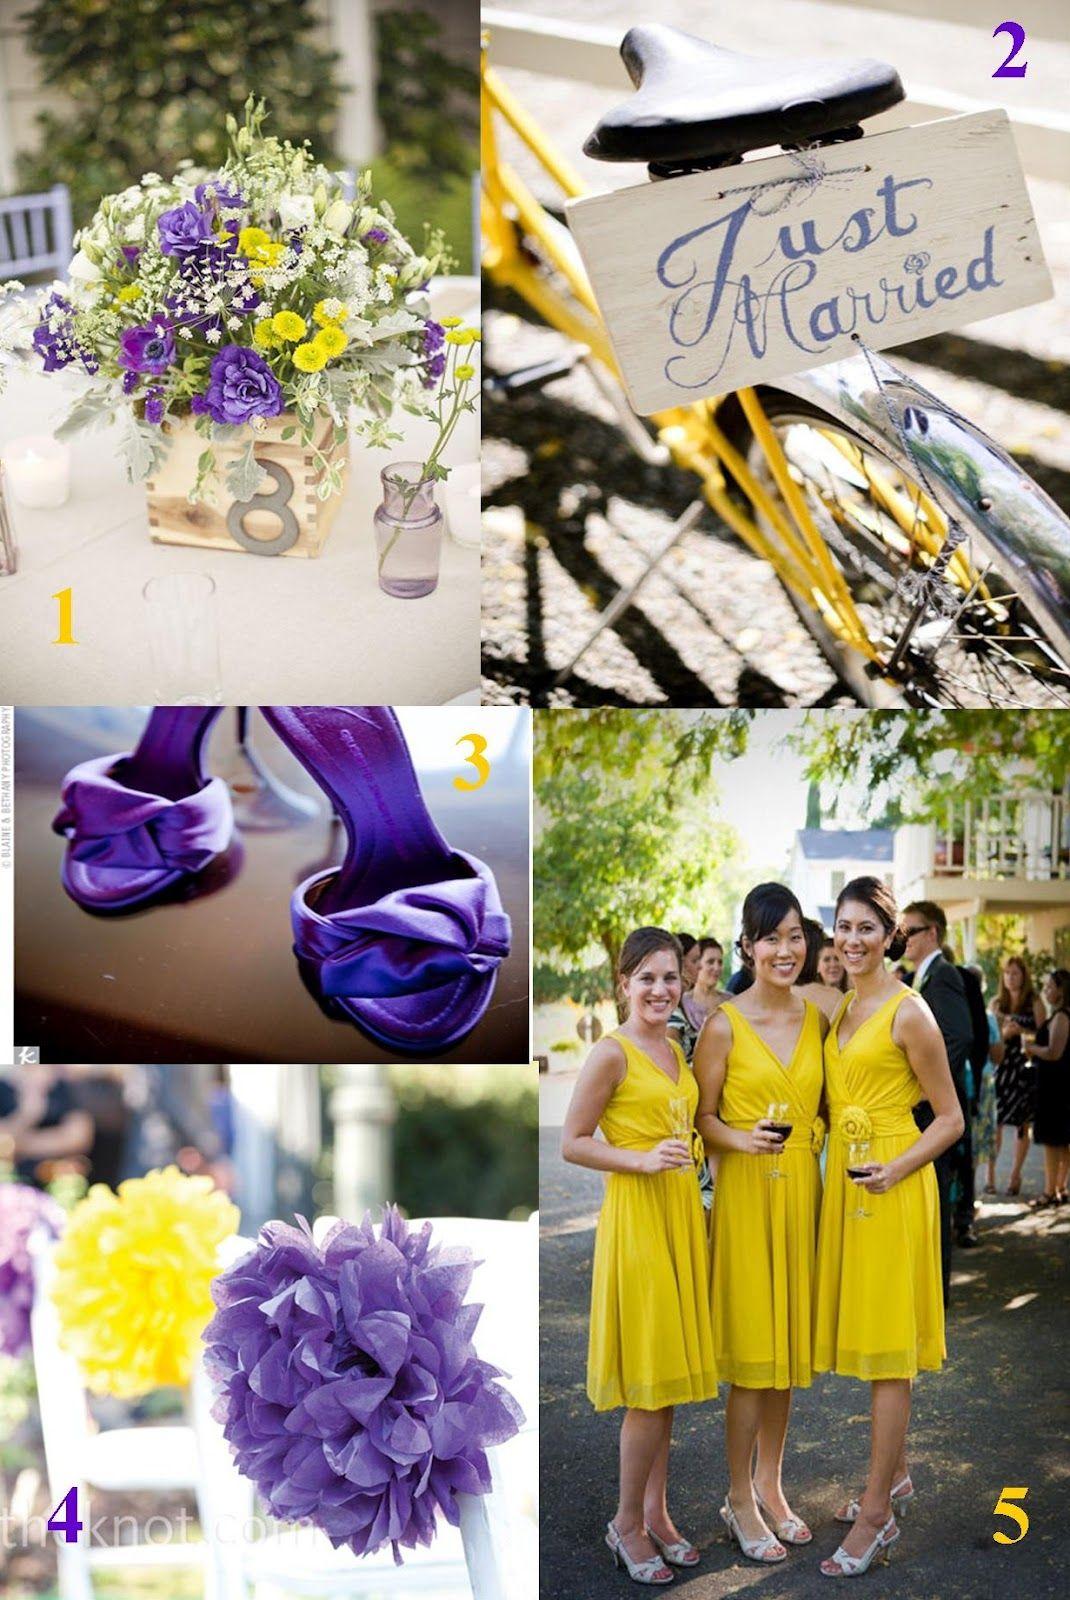 Purple and yellow wedding idea wedding photos showcasing the purple and yellow wedding idea wedding photos showcasing the best purple and yellow wedding ideas and junglespirit Images